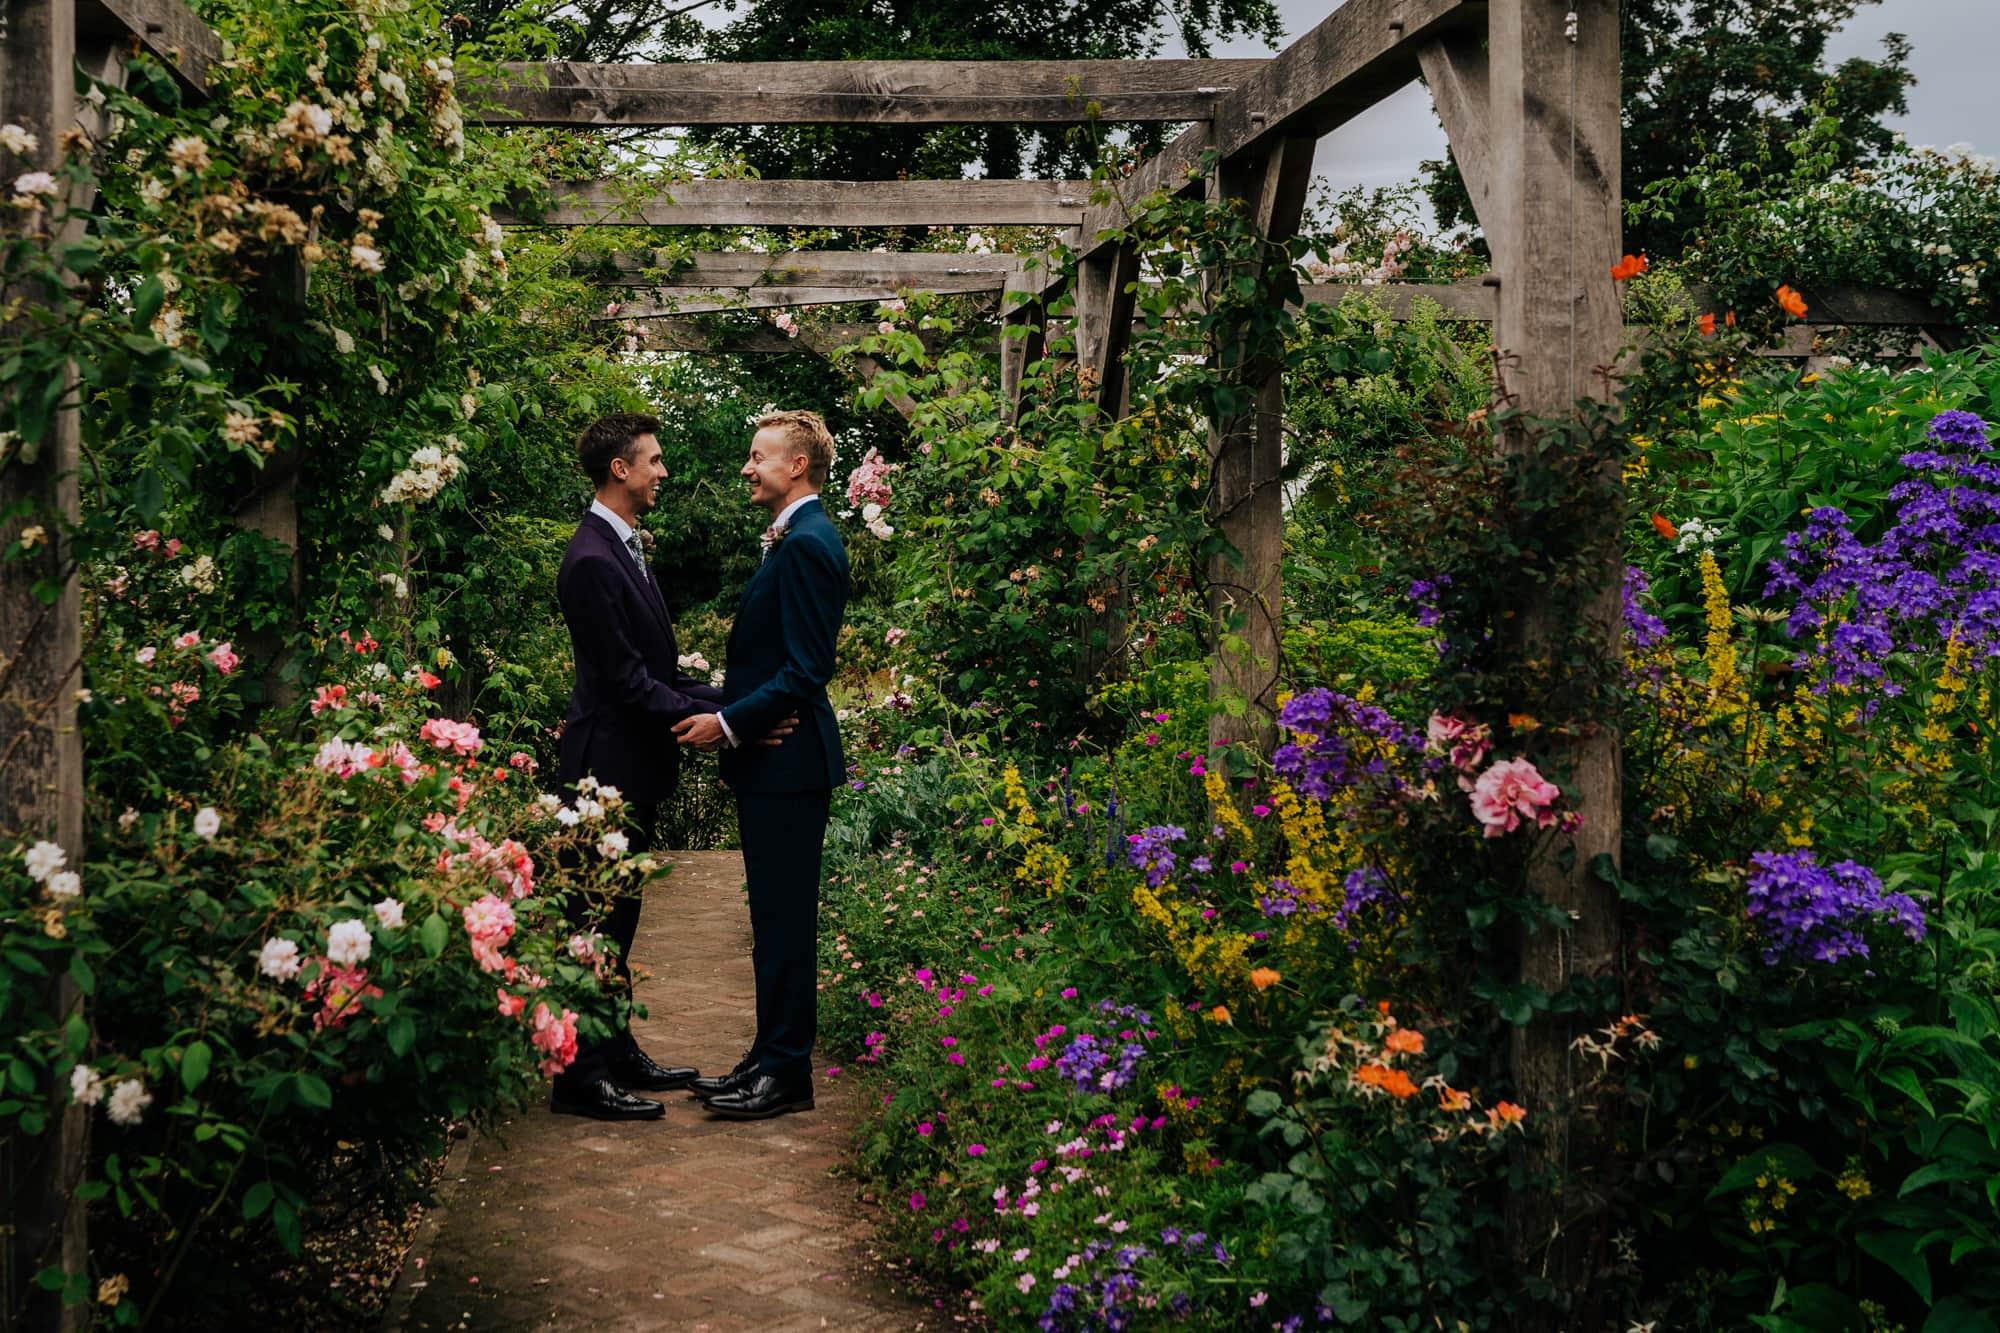 Wiltshire-same-sex-wedding-photographer.jpg